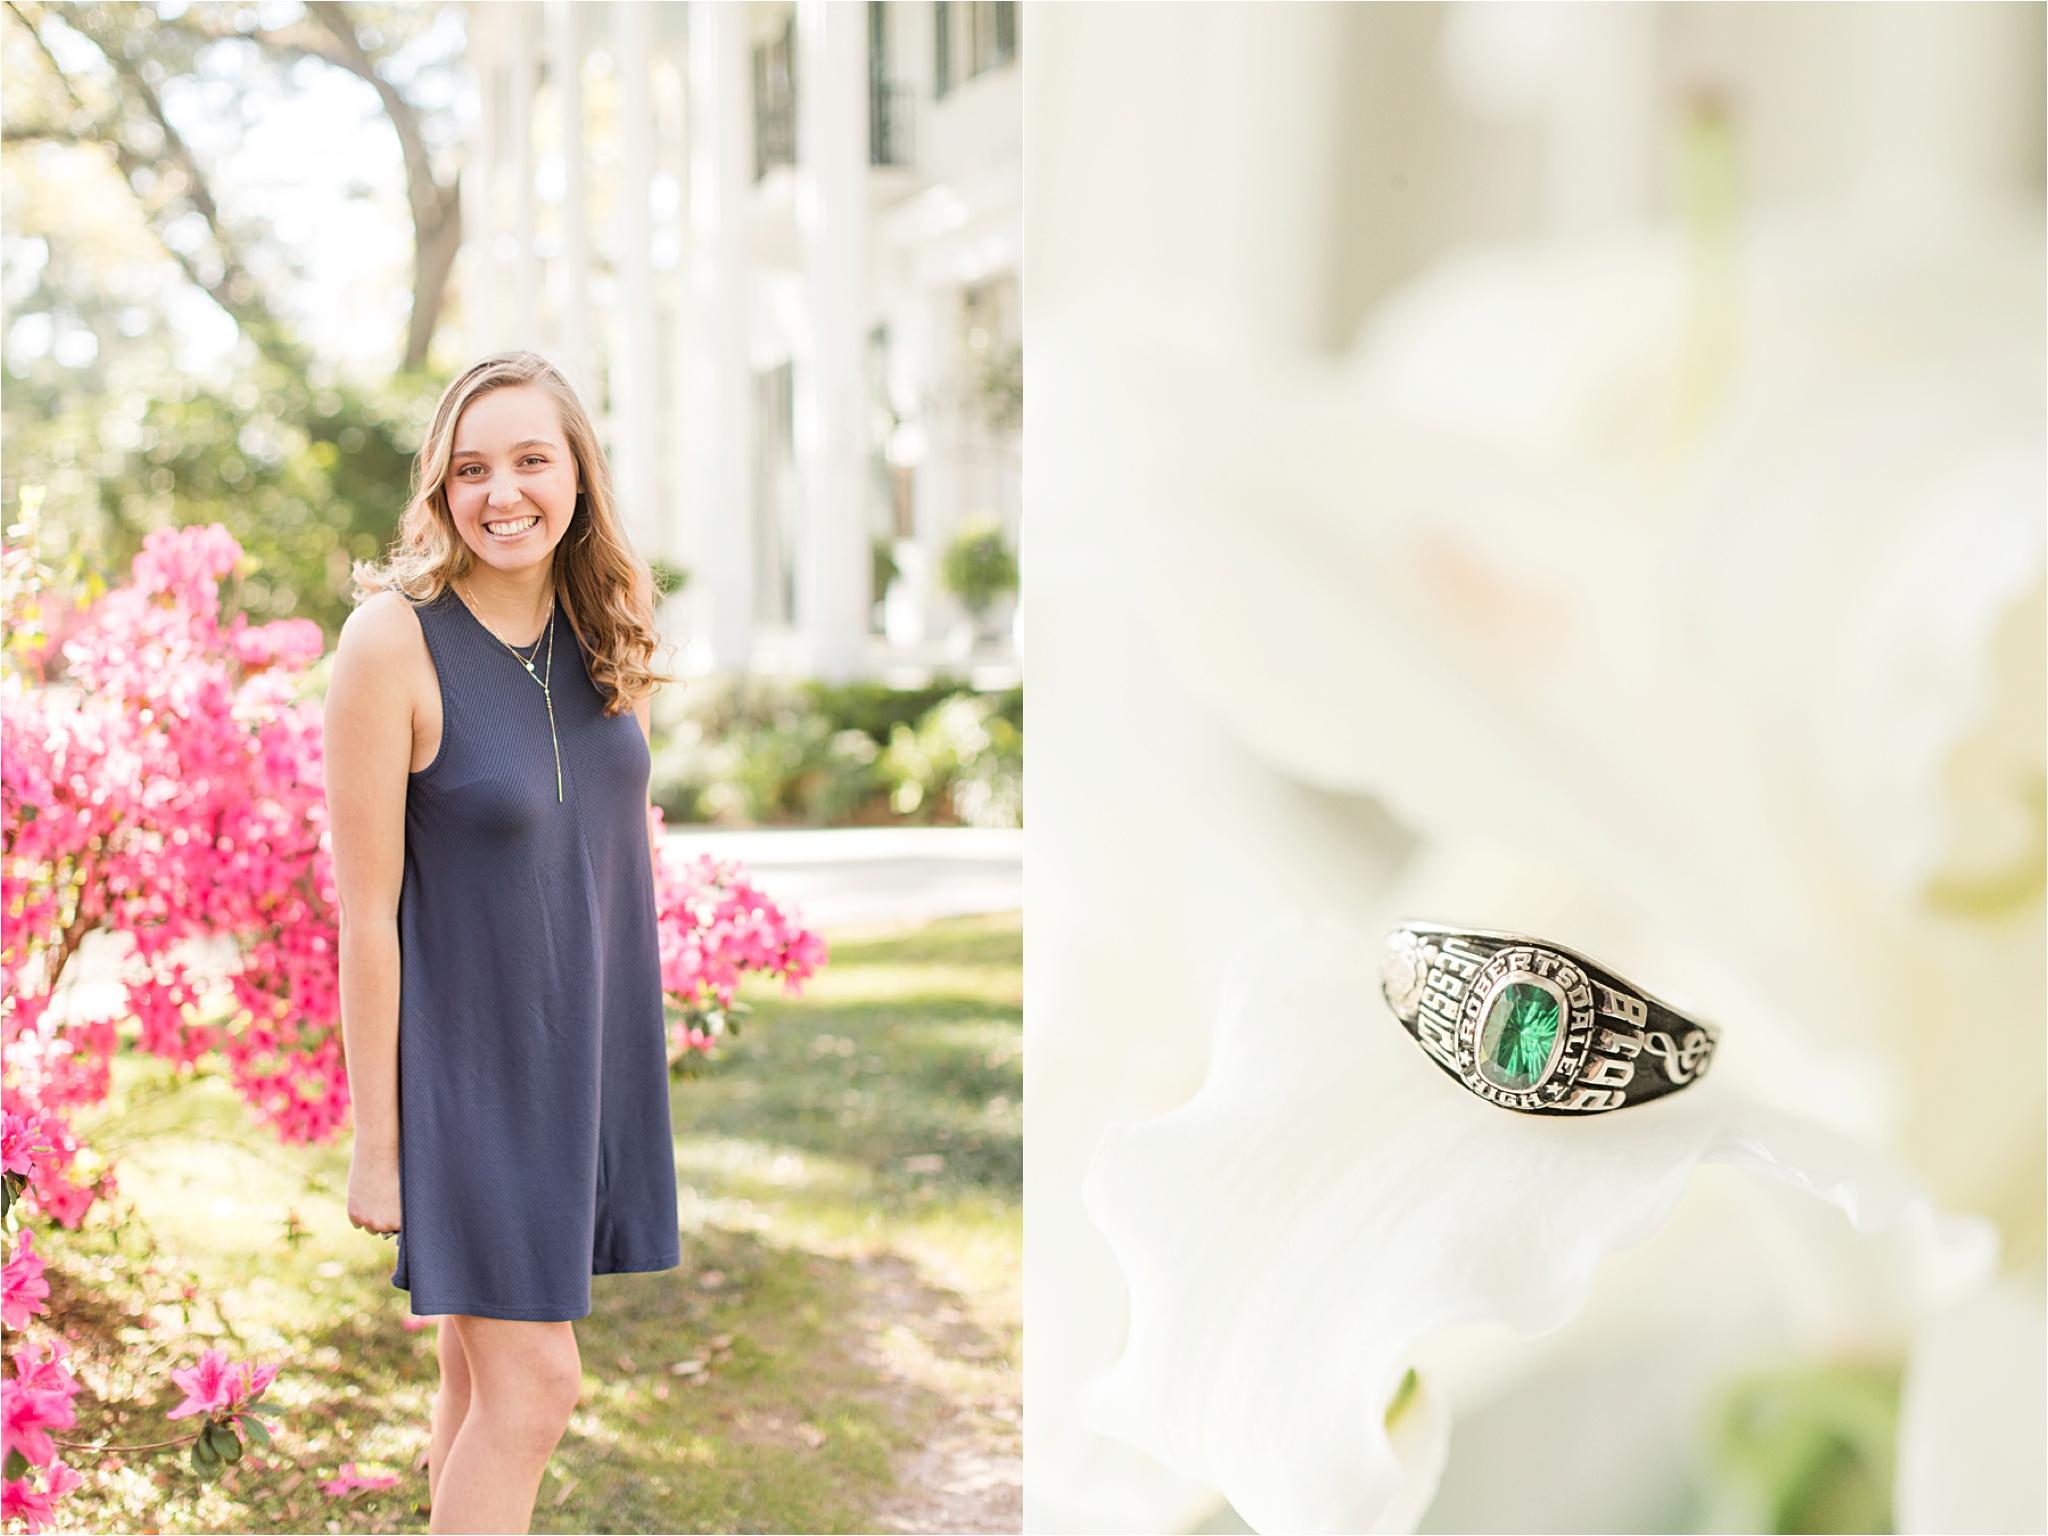 Bragg Mitchell Mansion Senior Photo Session | Jessica